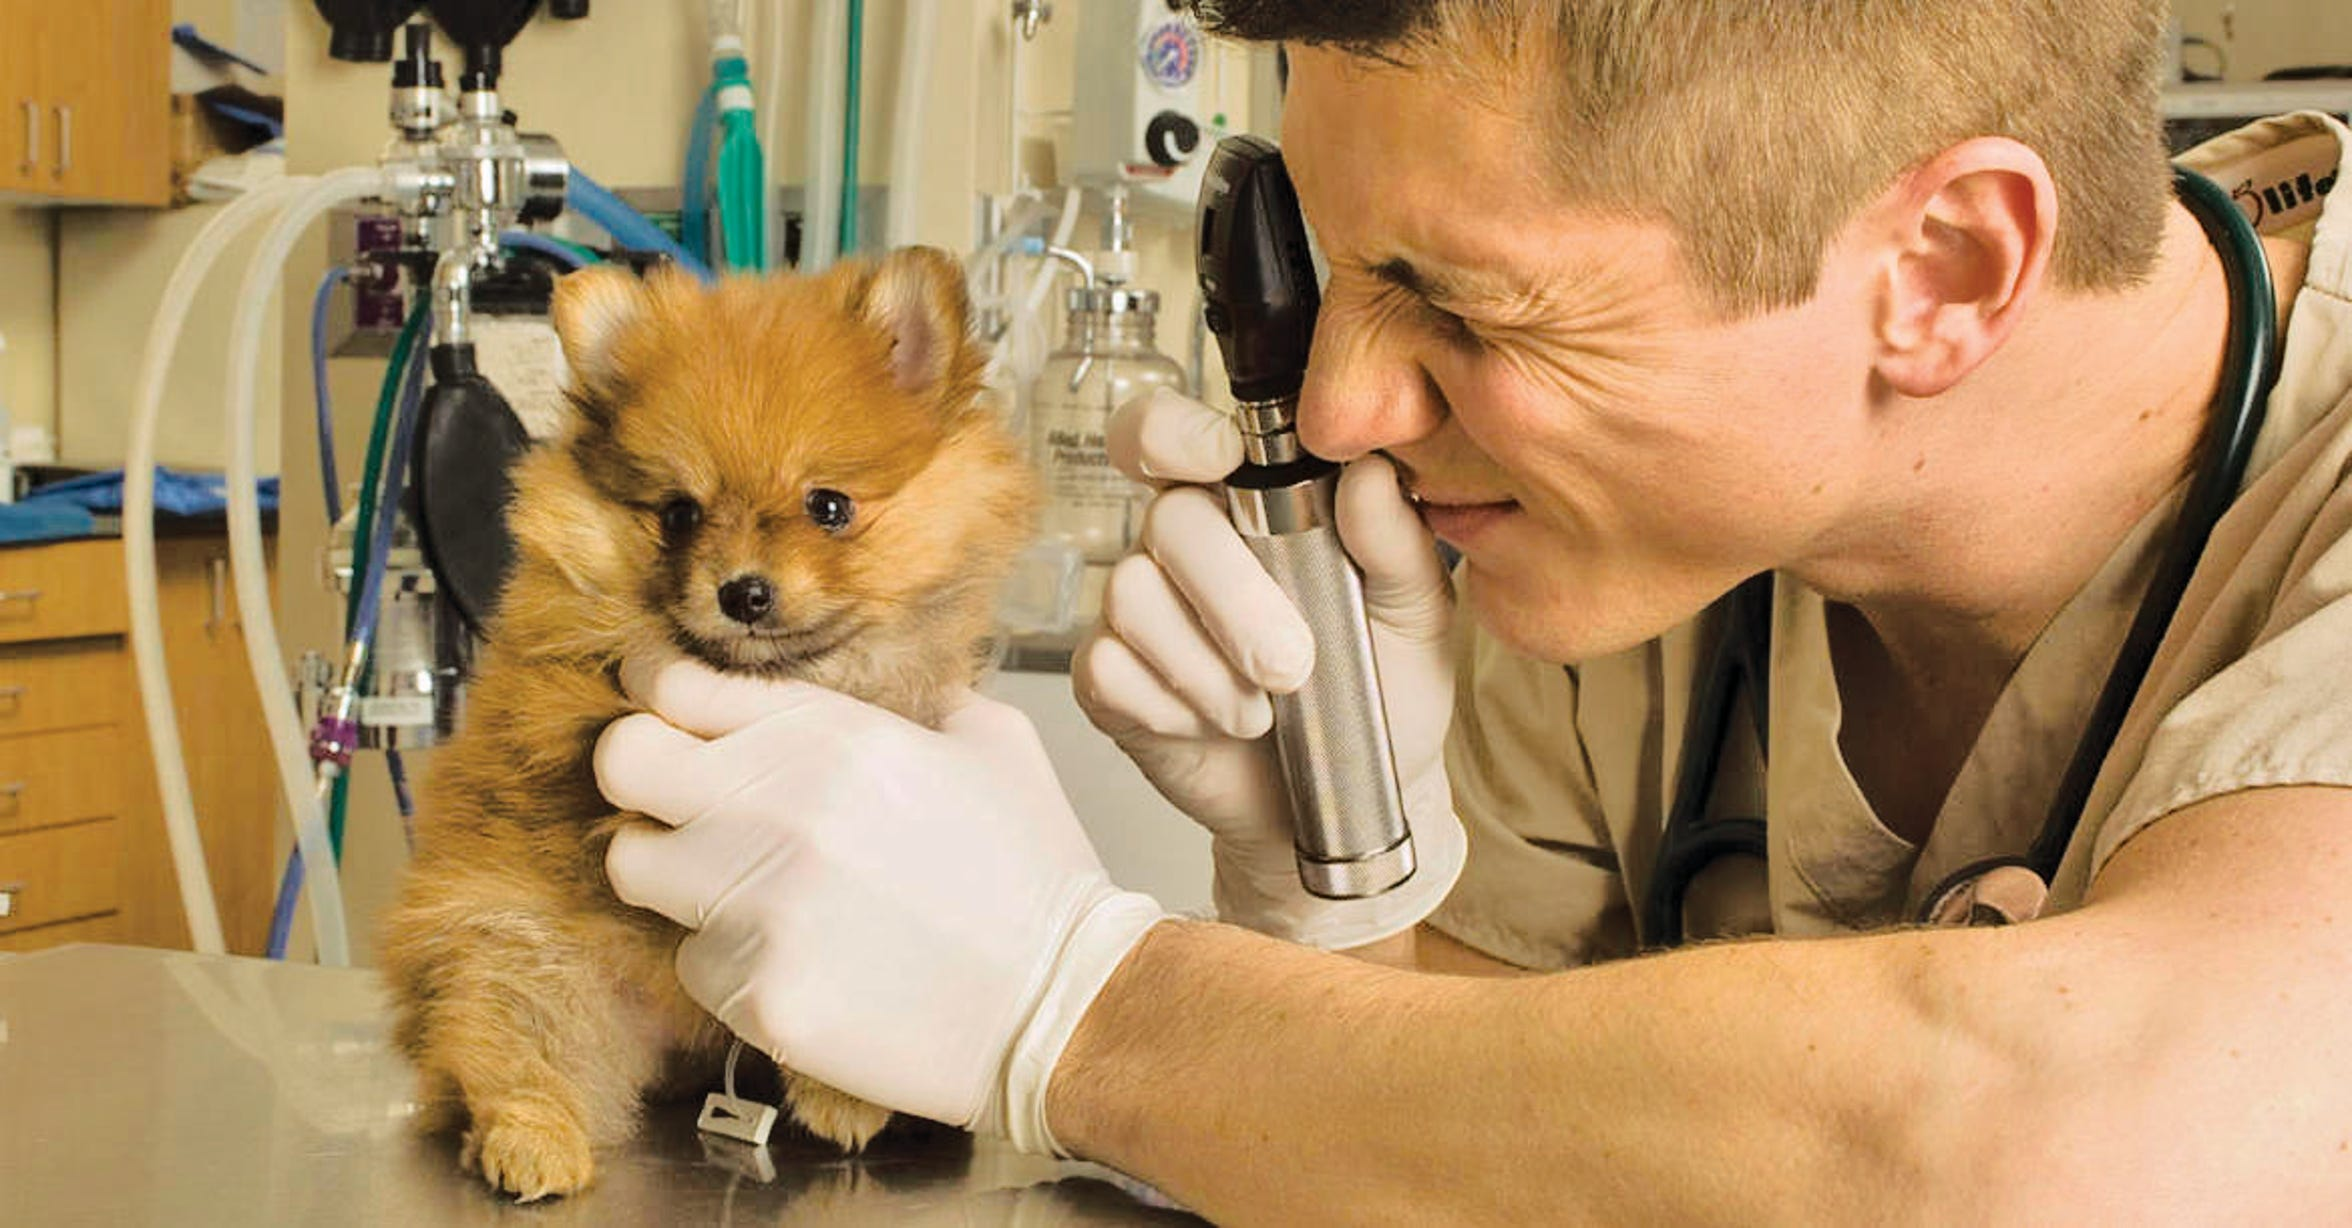 Best Veterinarian: Carter Animal Hospital